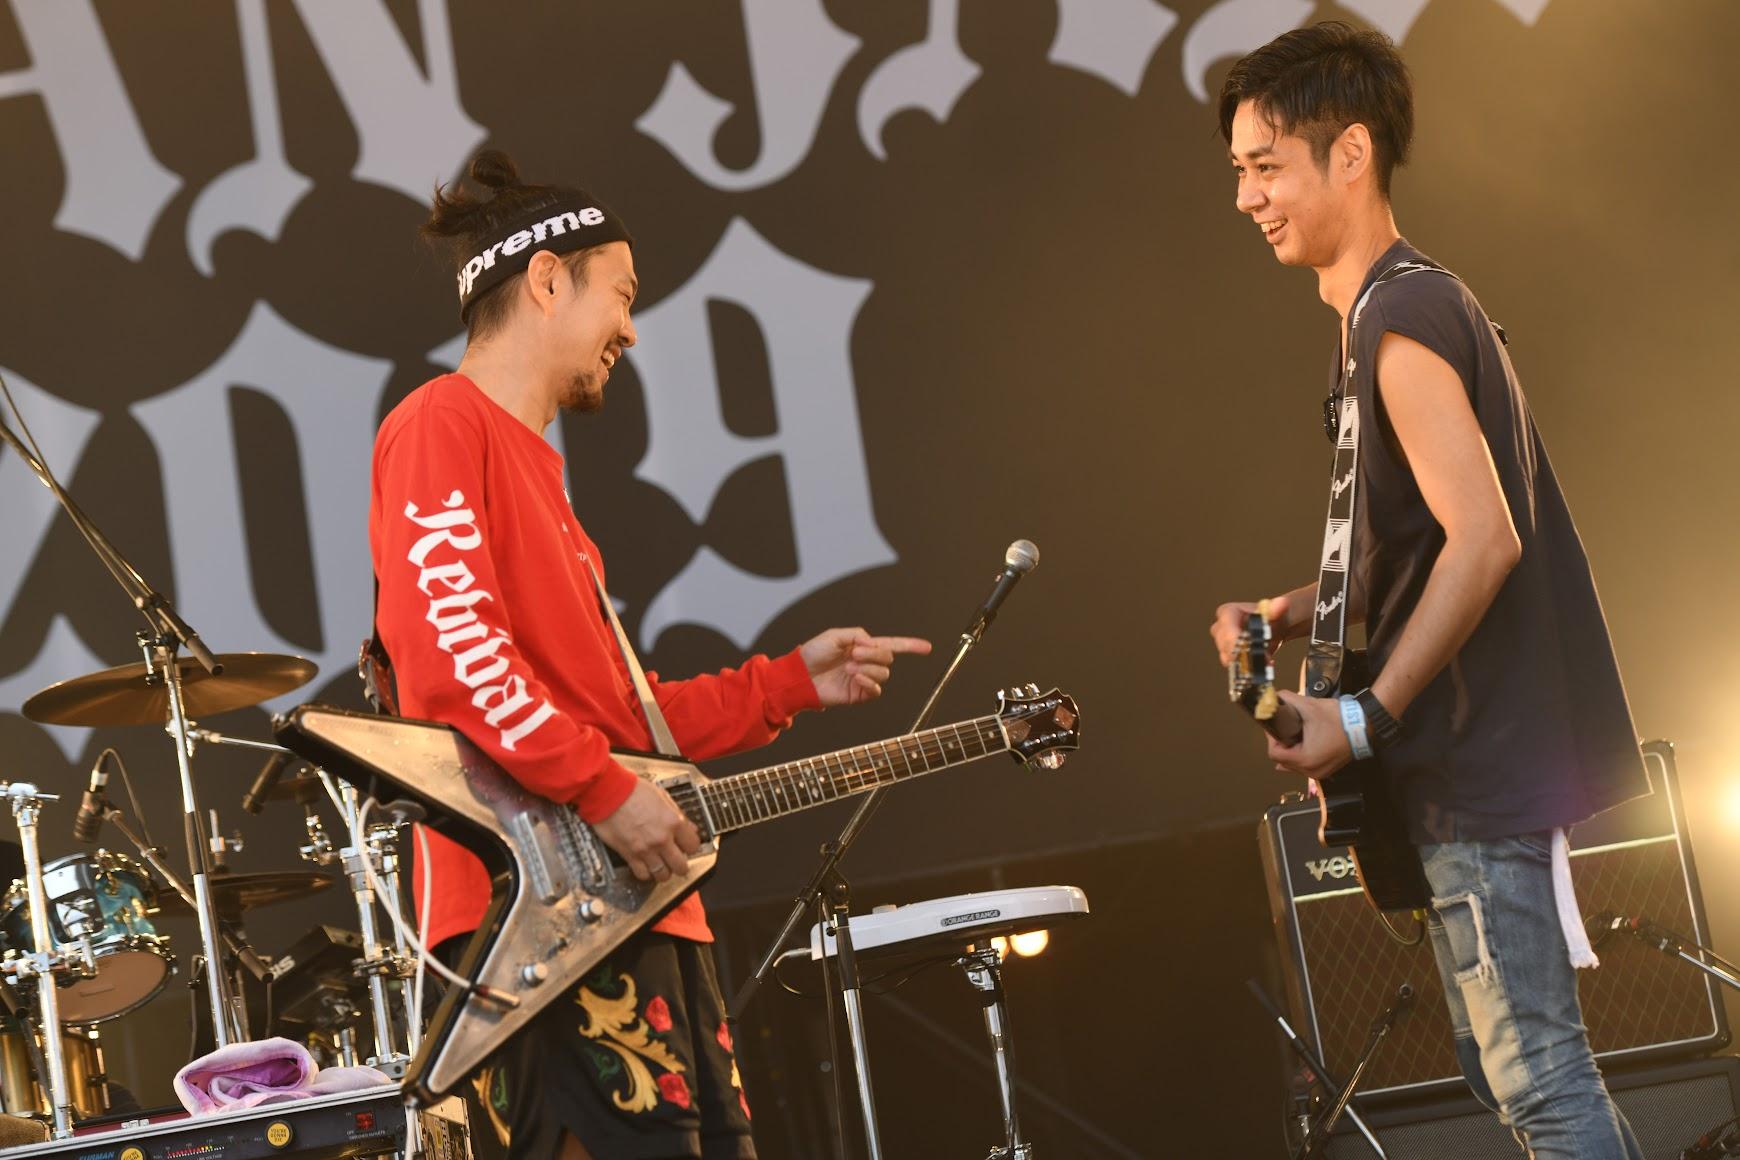 【迷迷現場】 JAPAN JAM 2019  ORANGE RANGE 迎來Kuboty( TOTALFAT )精彩共演